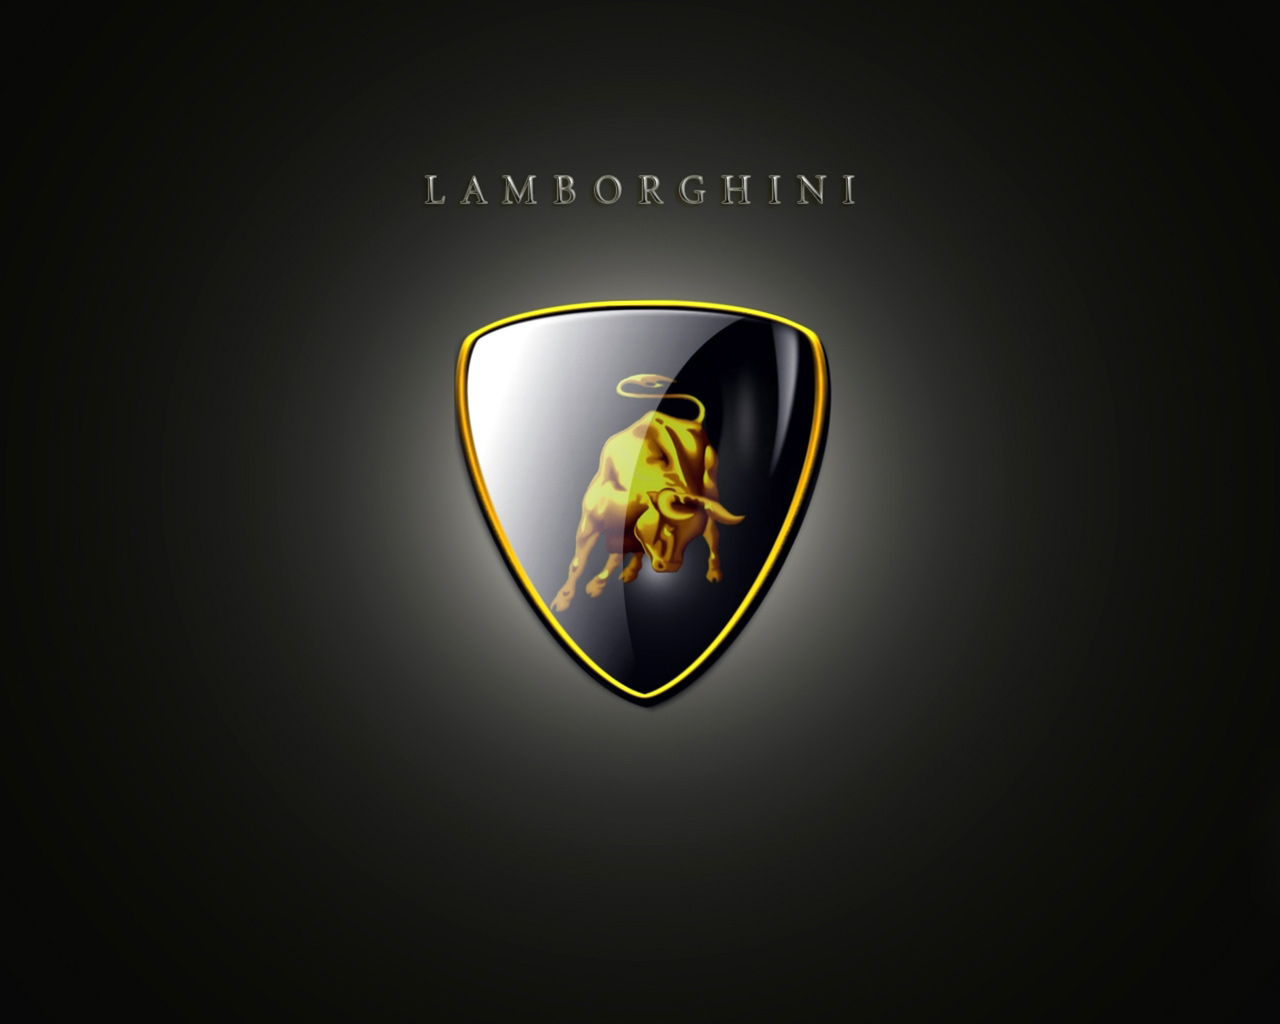 lamborghini logo hd wallpaper - photo #11